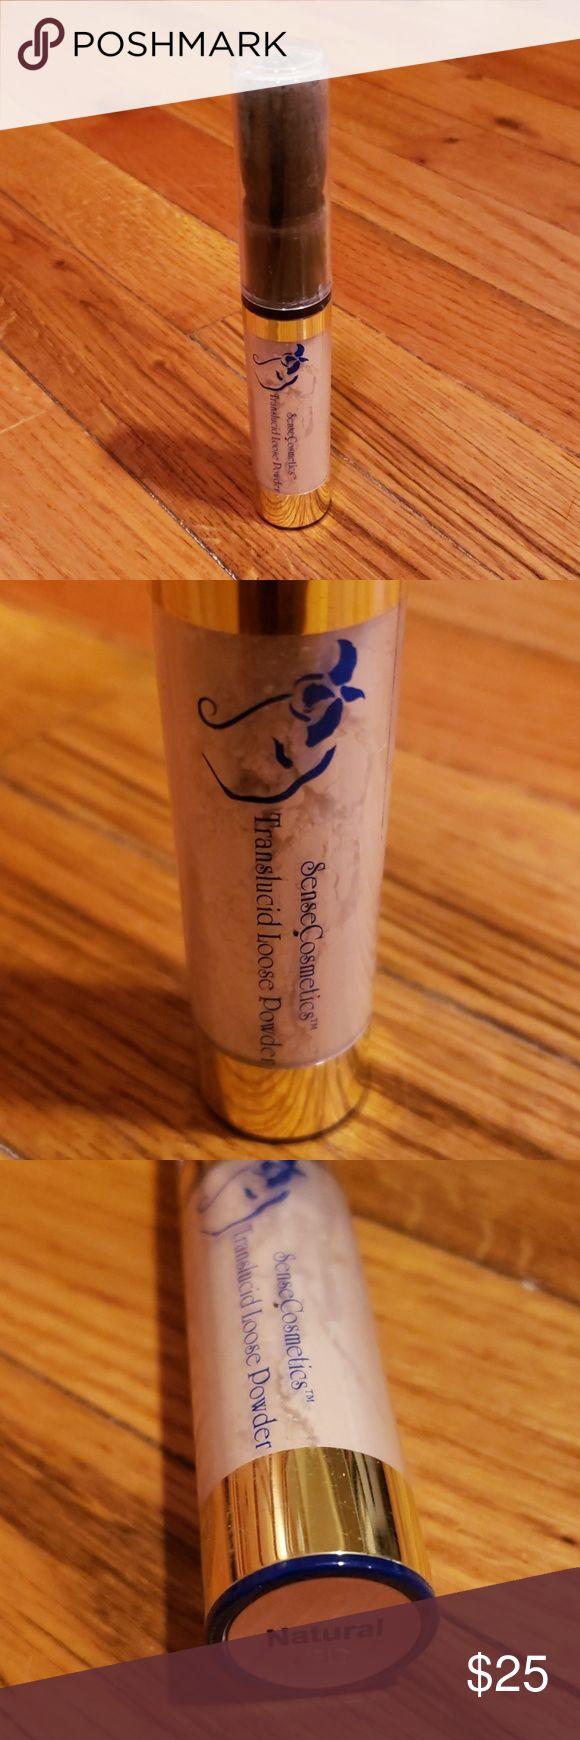 NWOT Sense Cosmetics Translucid Powder Loose powder